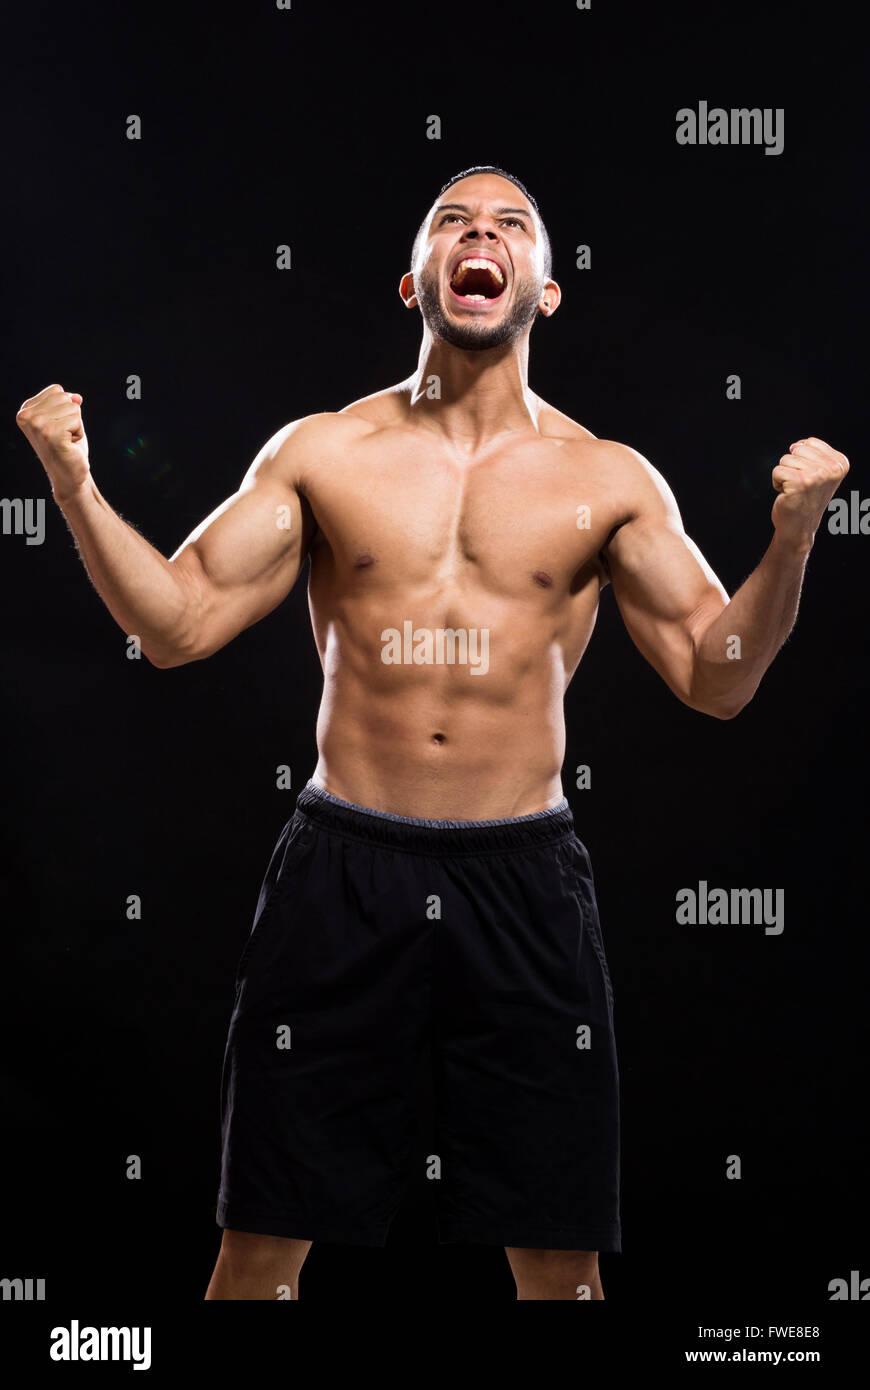 Furious man screaming. Black Background - Stock Image